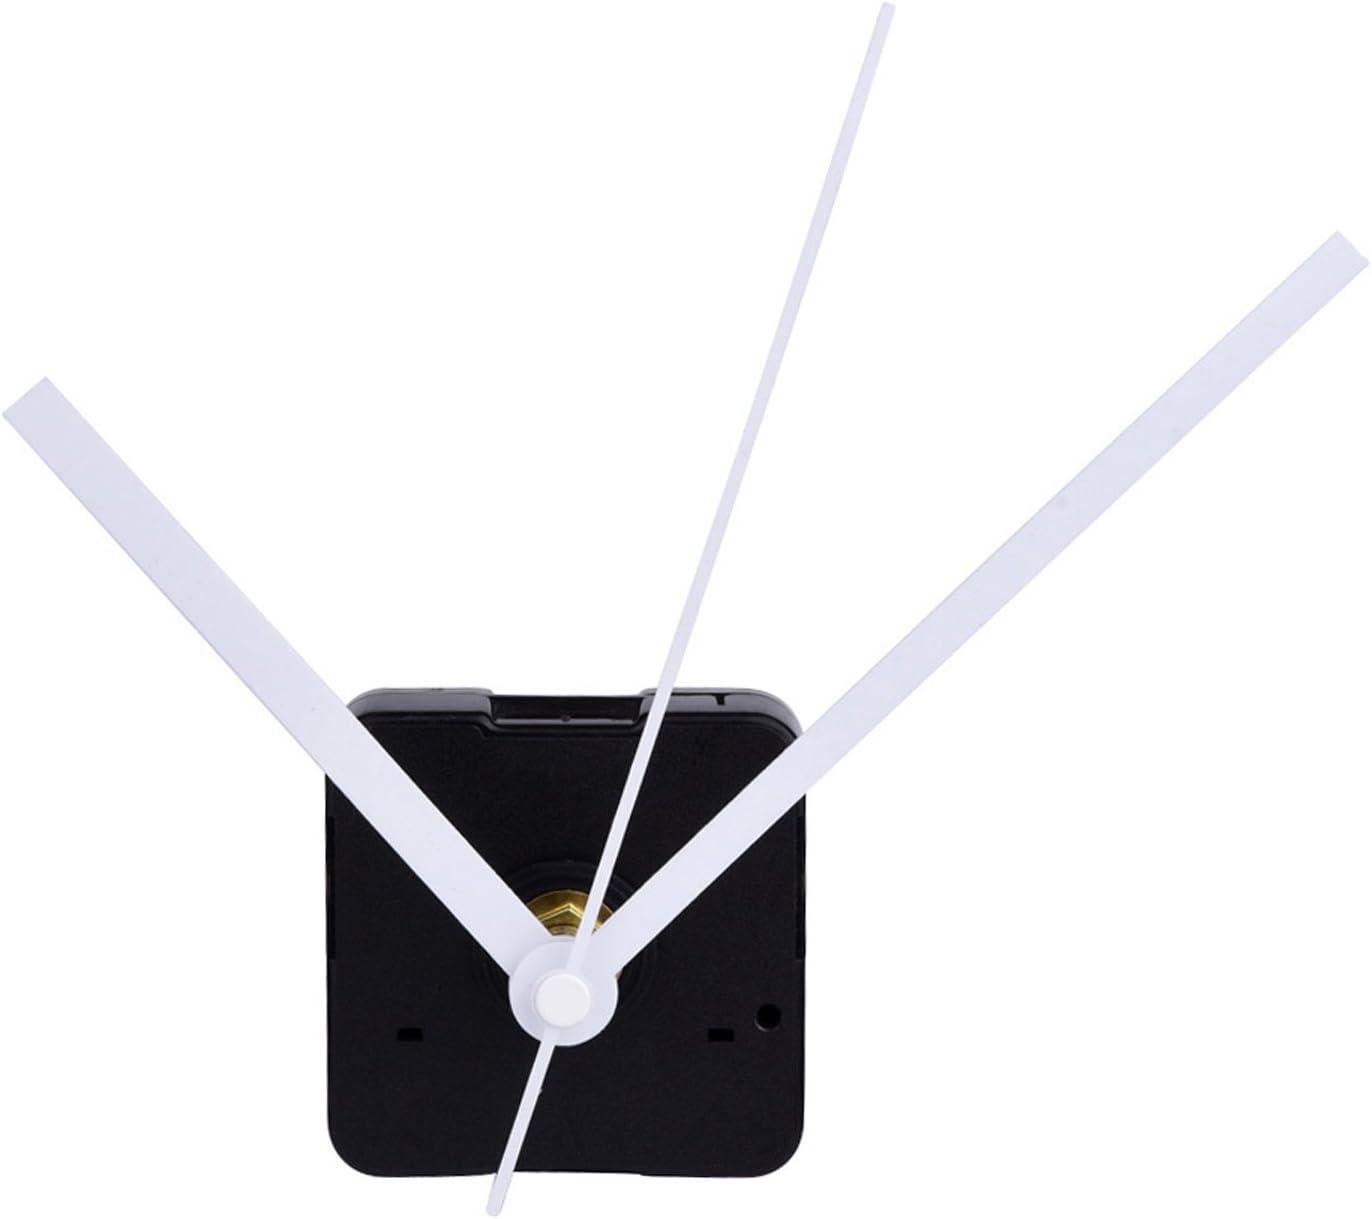 Mudder Silence Quartz Clock Movement, 11/25 Inch Maximum Dial Thickness, 4/5 Inch Total Shaft Length (White)